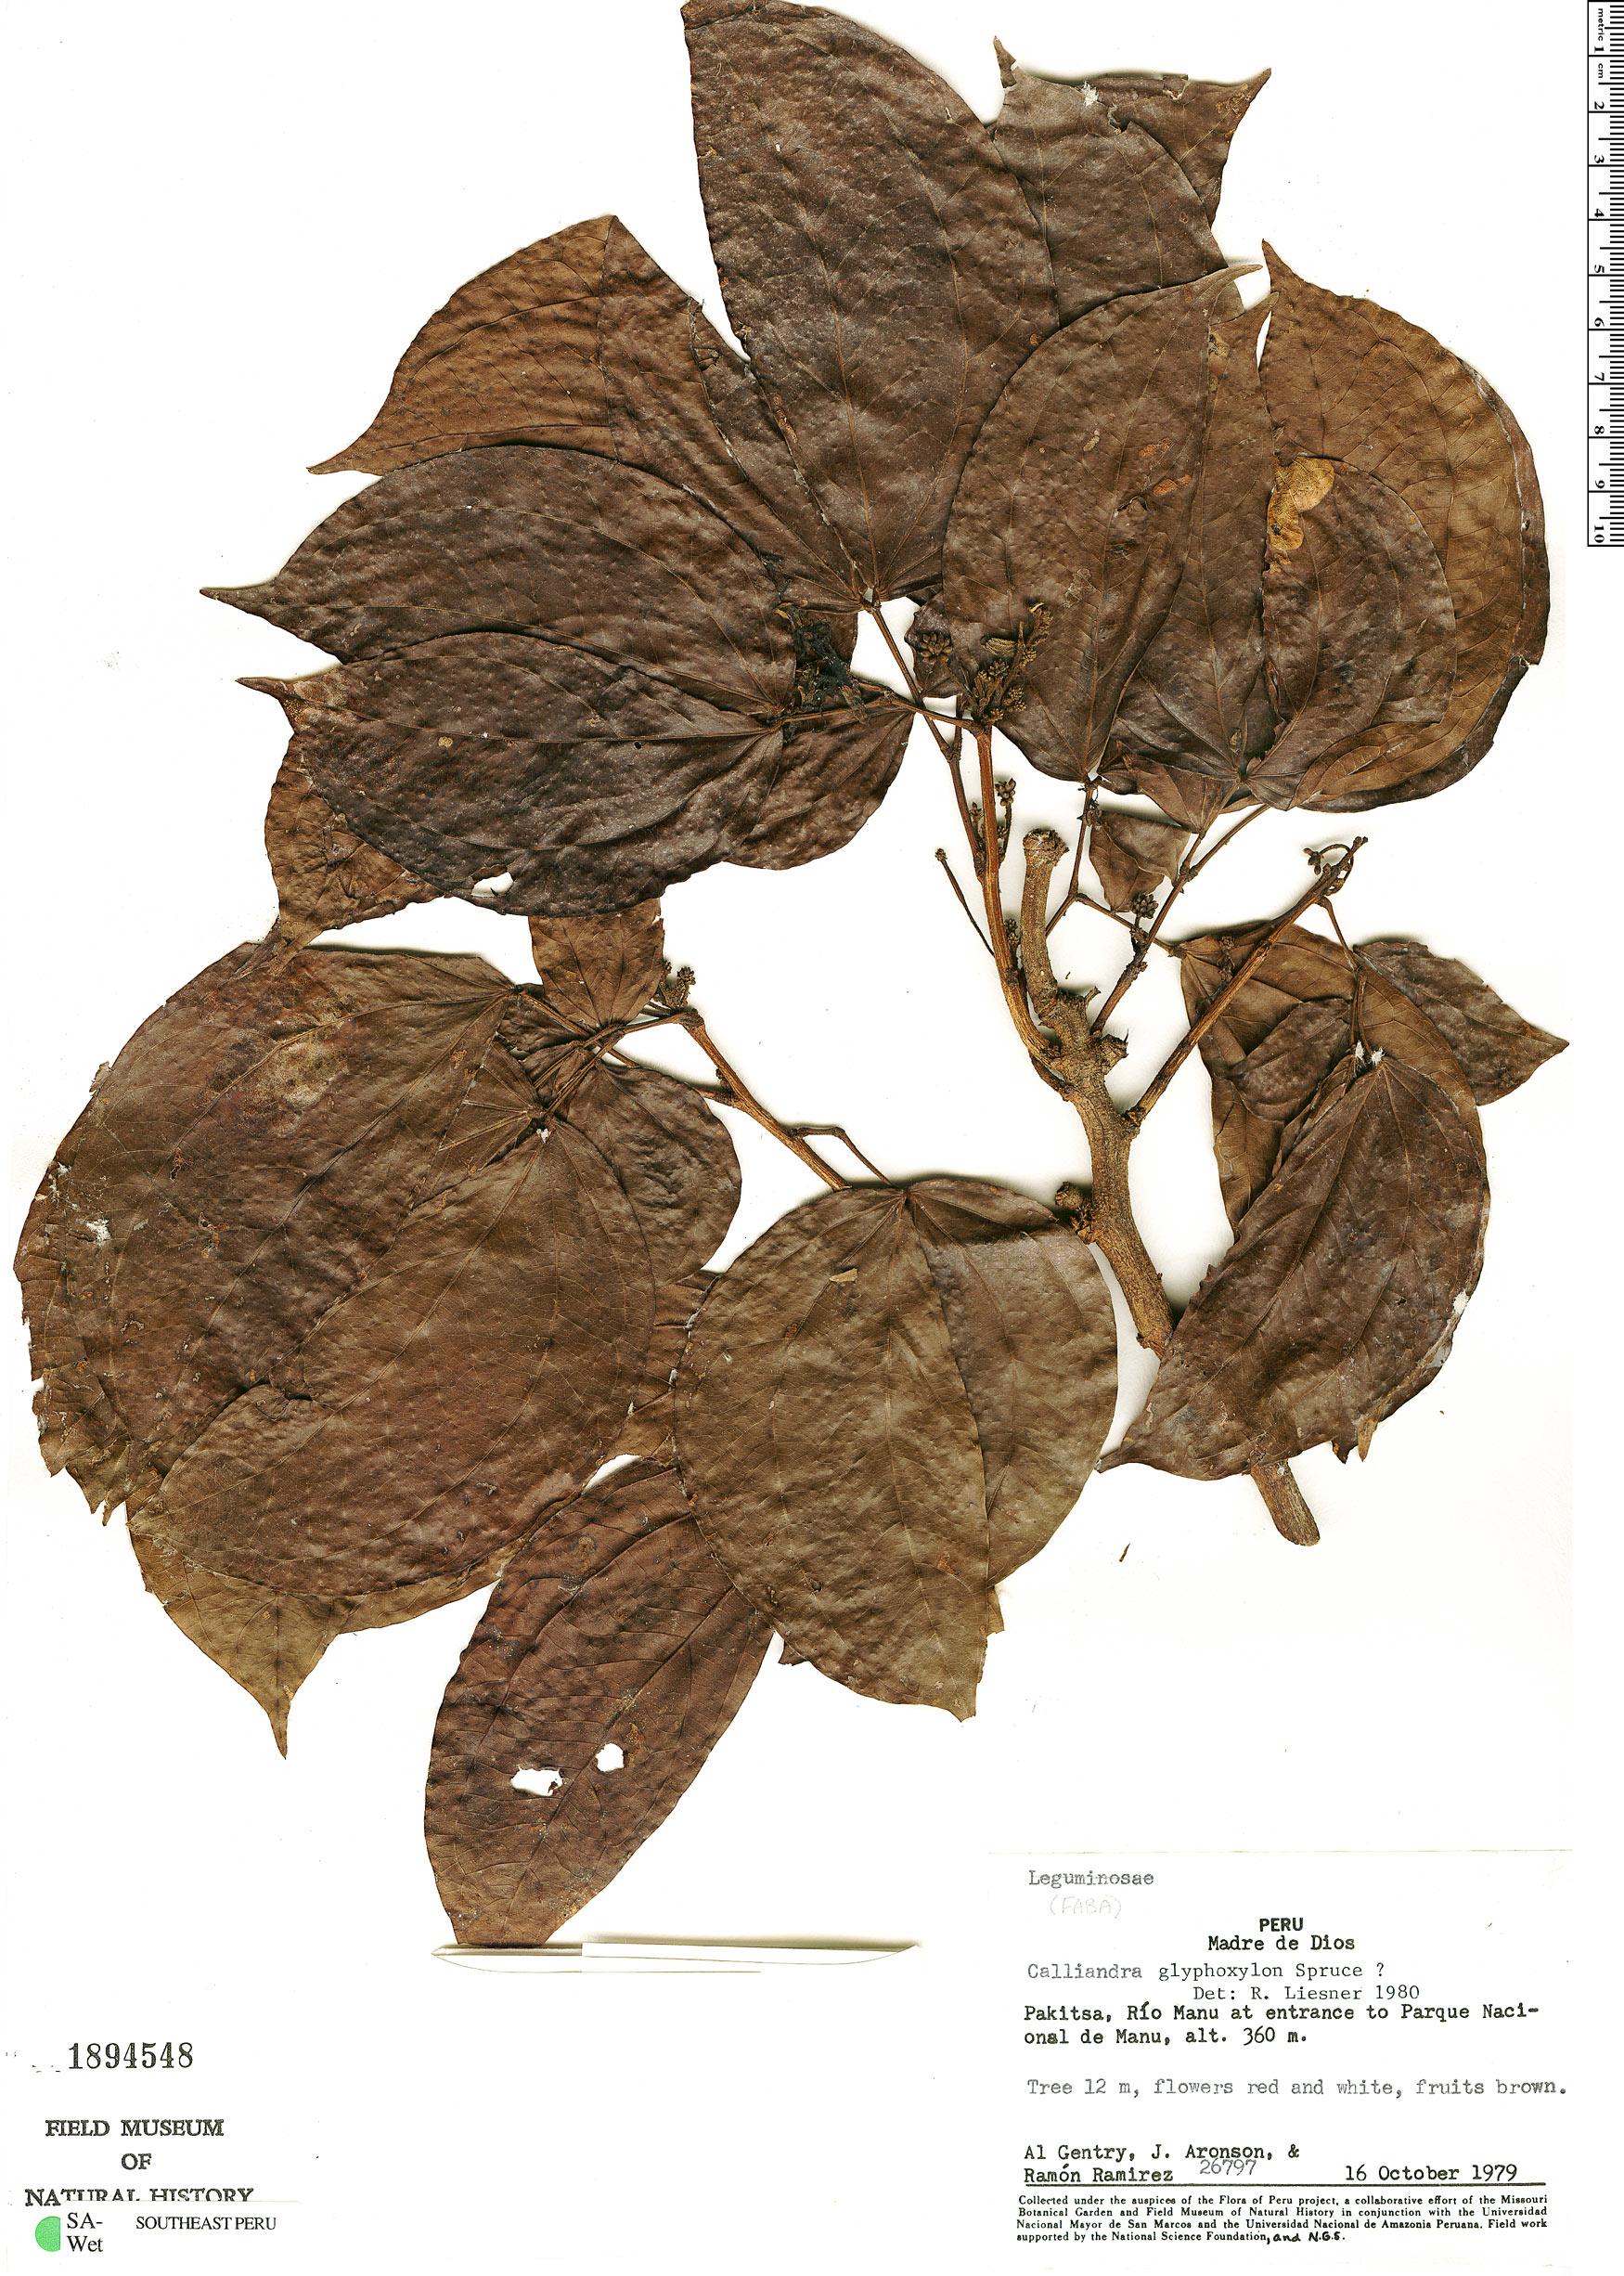 Specimen: Calliandra glyphoxylon